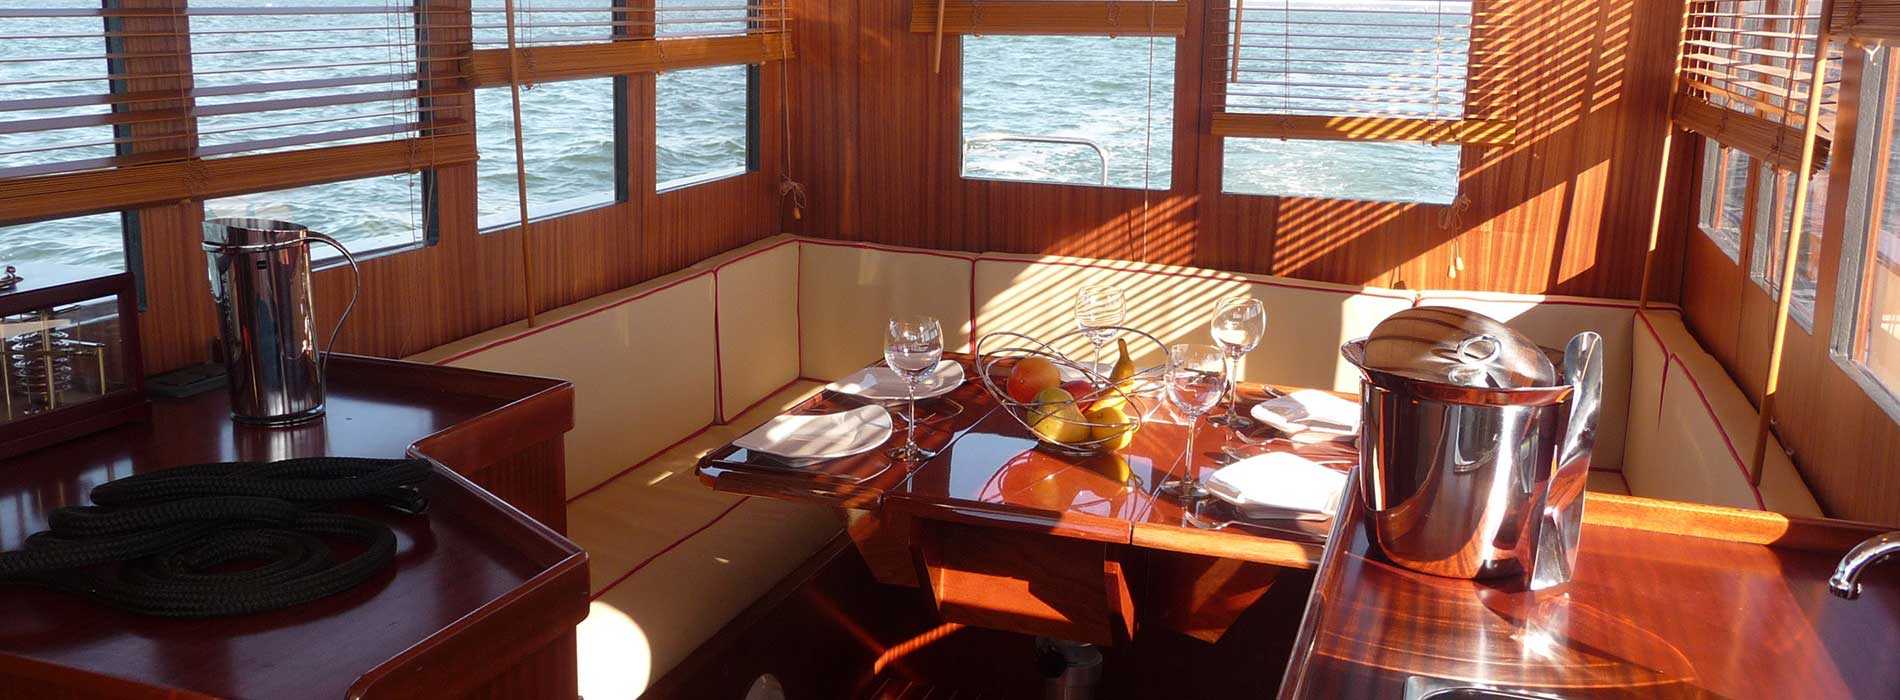 beacher nautique bateau trawler interieur